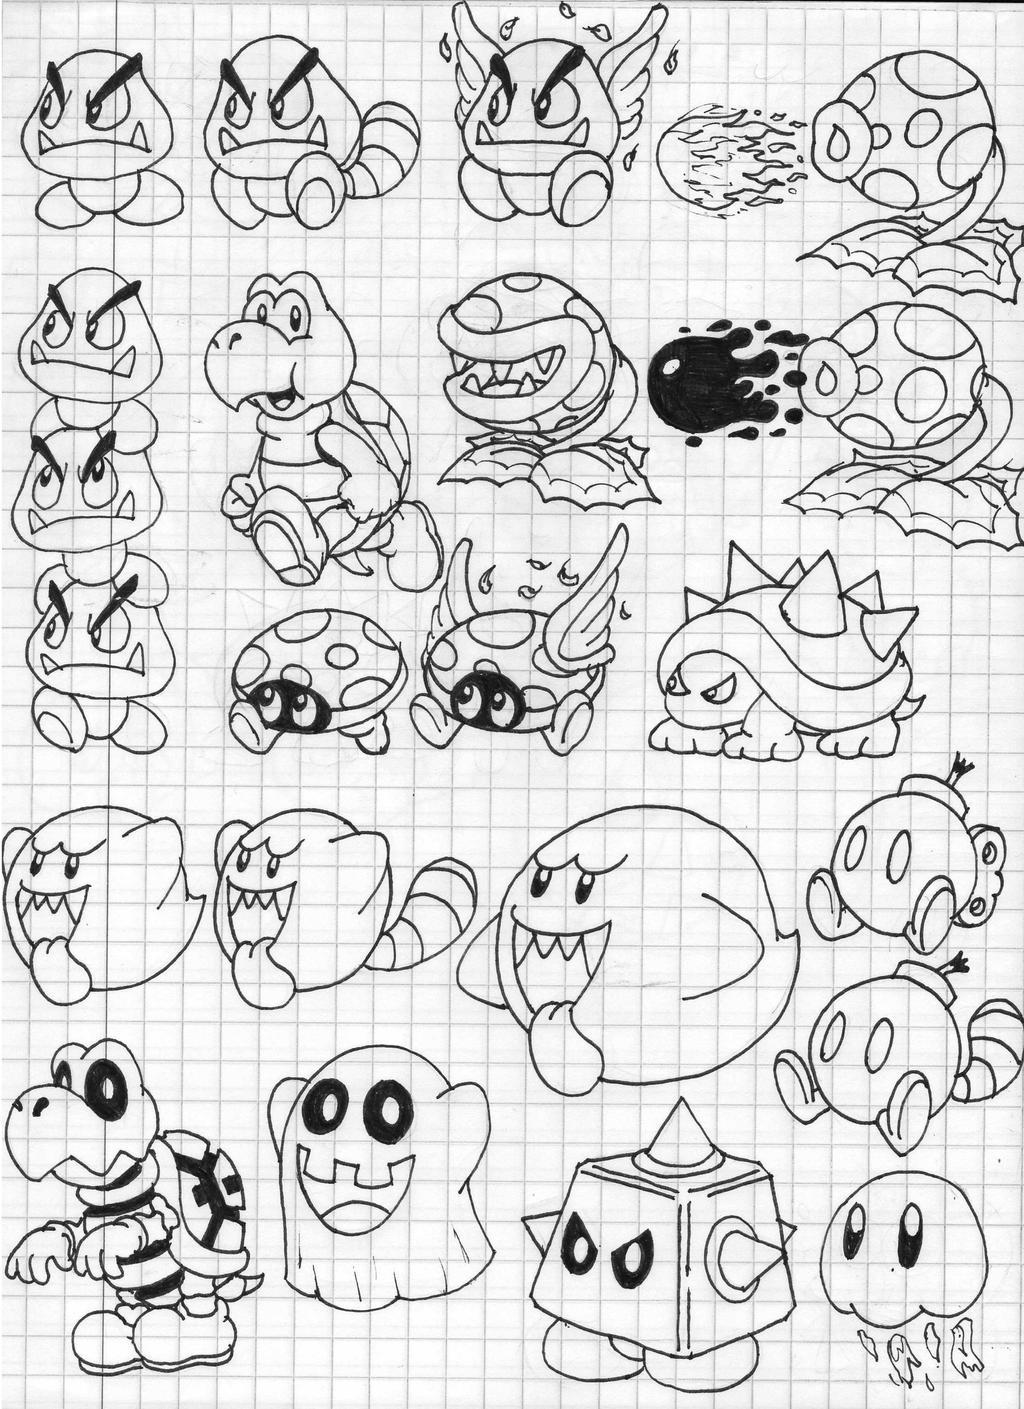 Super mario 3d land enemies doodles part 1 by for Nintendo land coloring pages